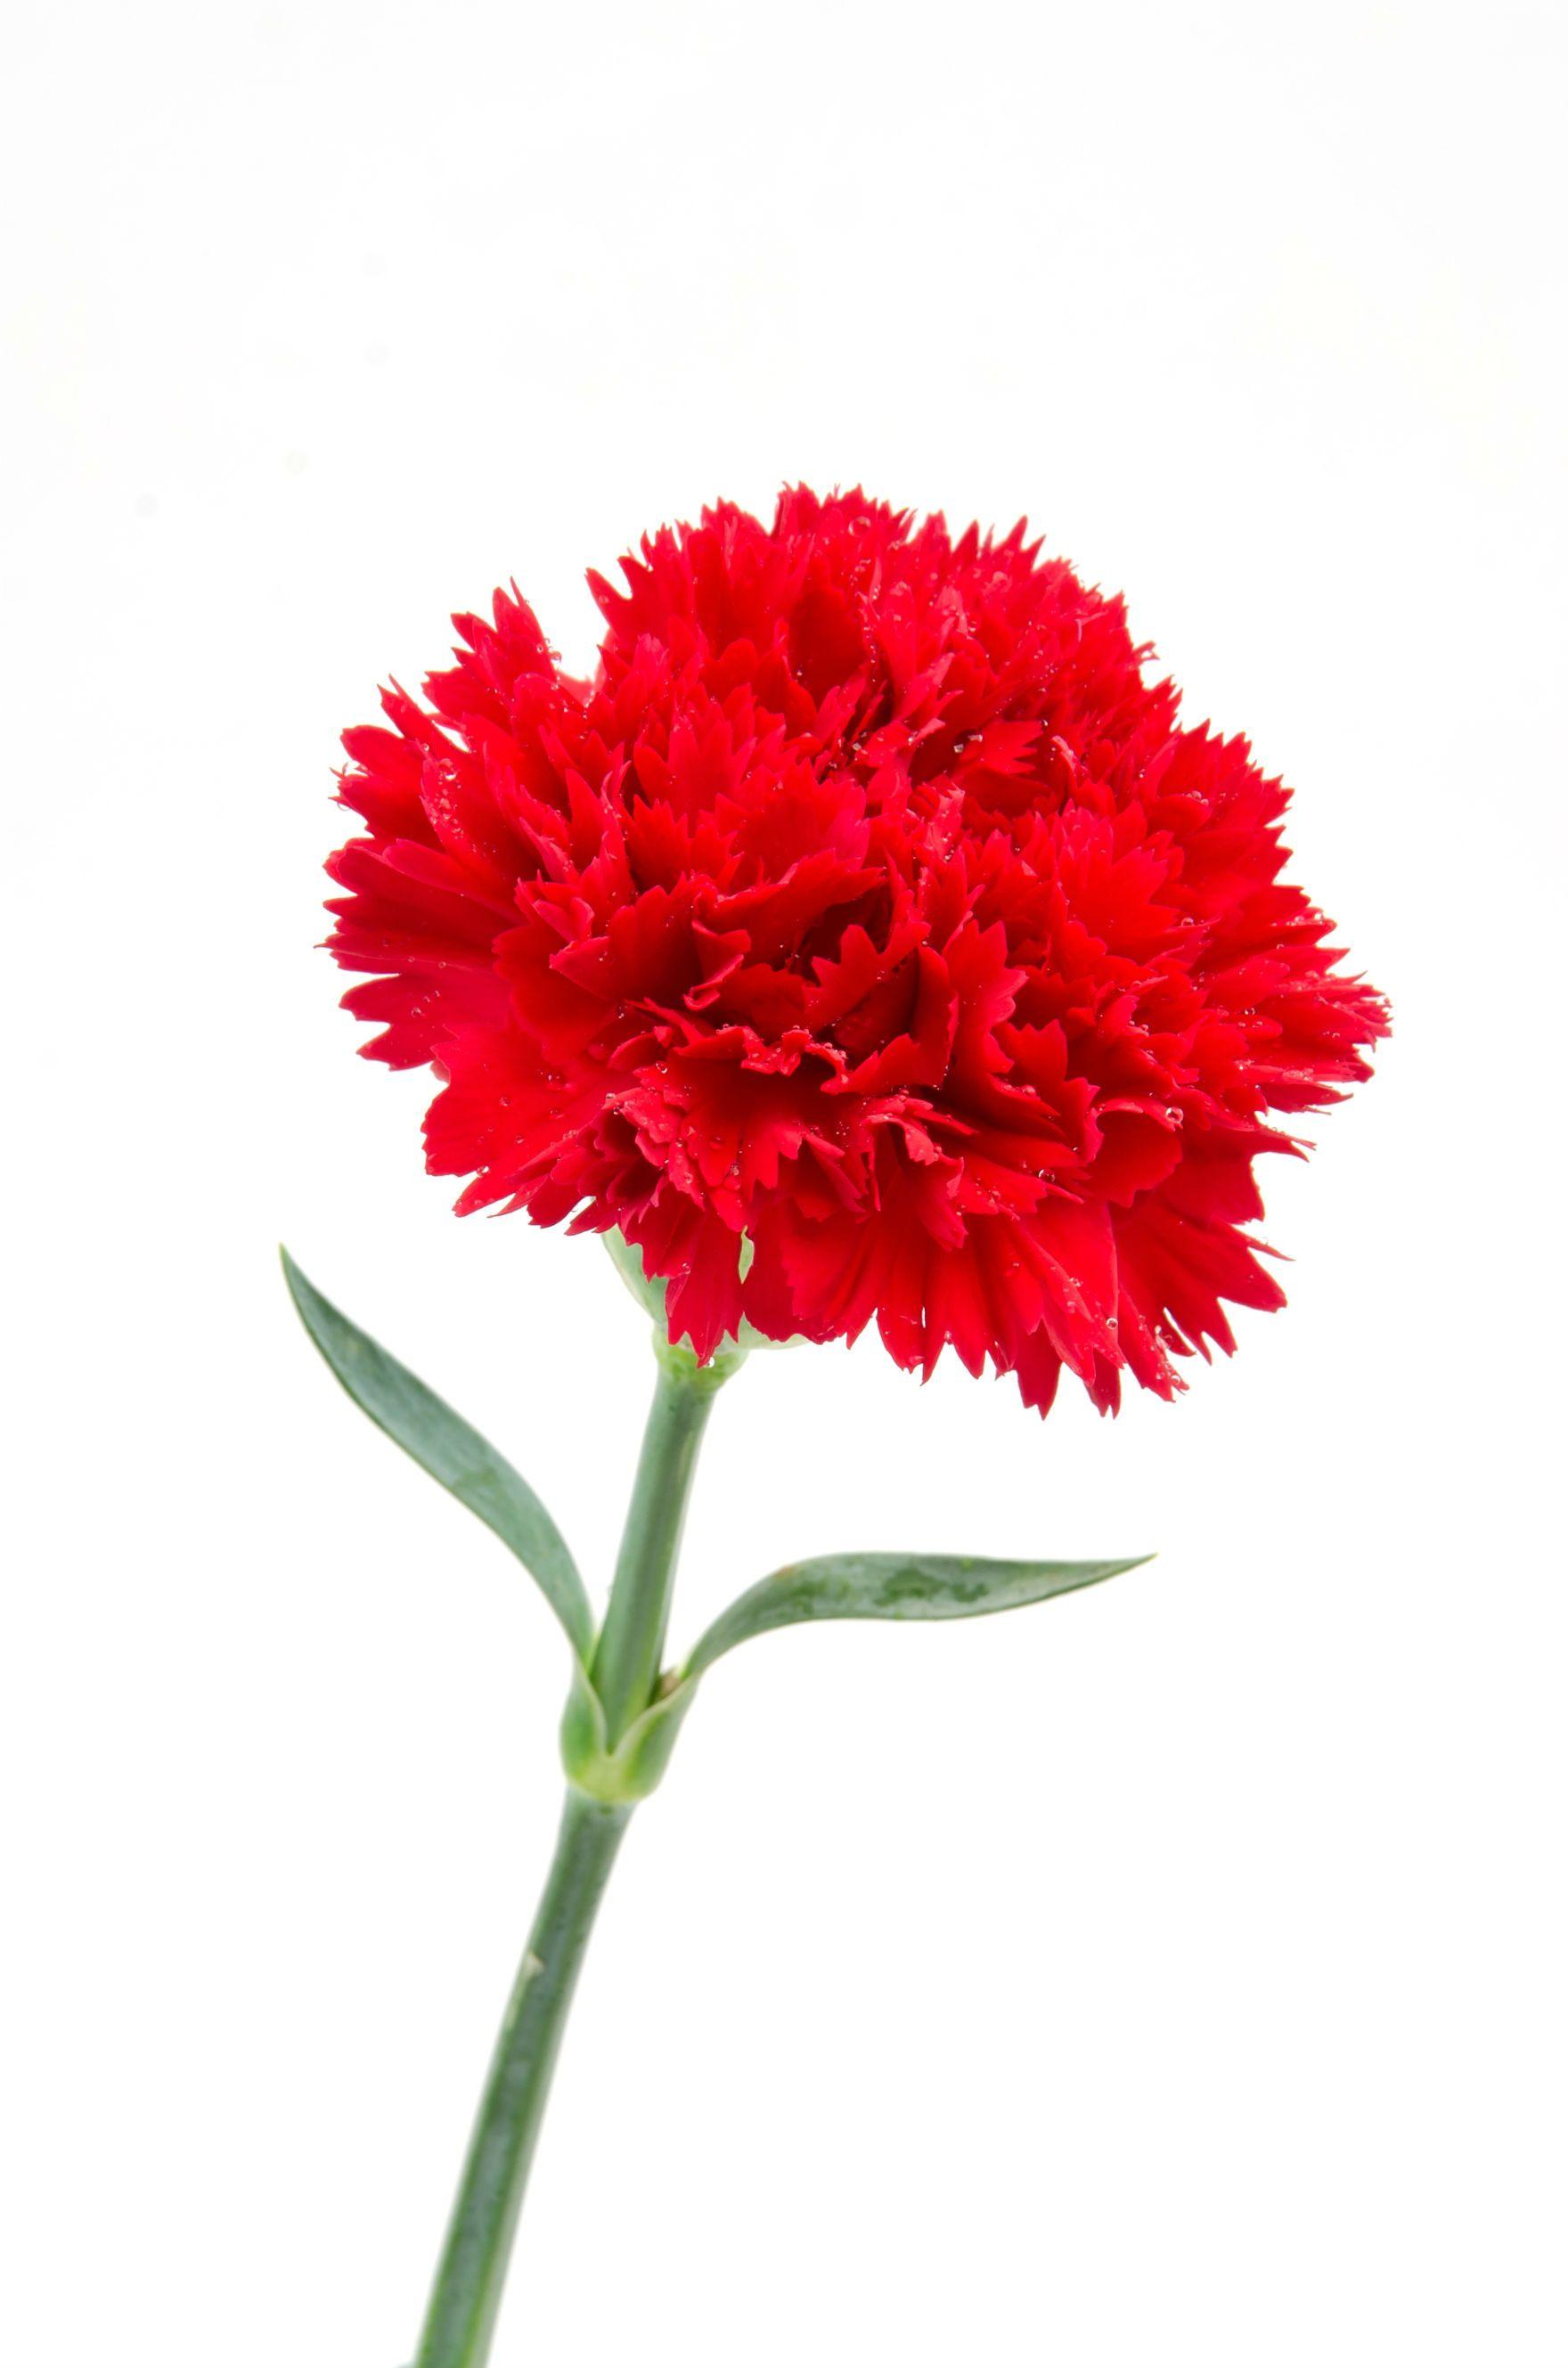 Carnation Karanfil Dianthus Caryophyllus Red Means My Heart Breaks Flowers Amazing Flowers Carnation Flower